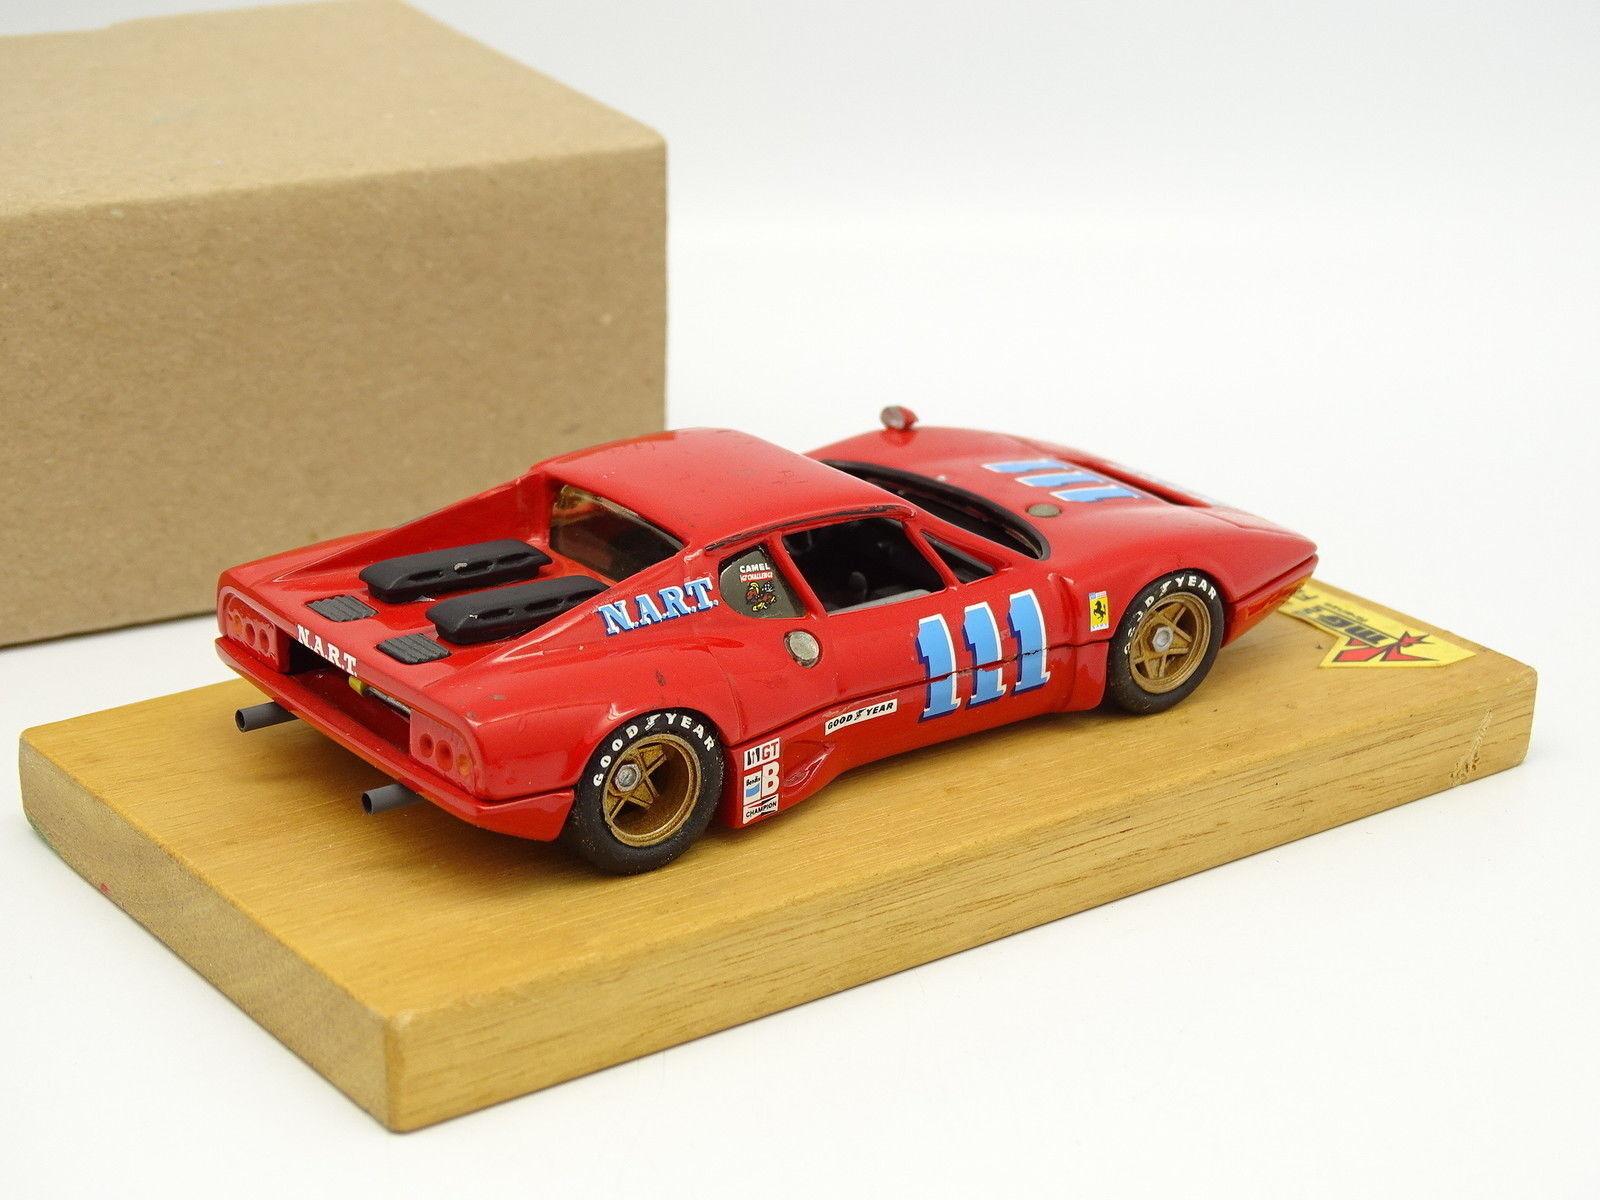 MG Modelle Set aufgebaut aufgebaut aufgebaut Metall 1 43 - Ferrari 512 BB NART Nr.111 Sebring 1975 ab7582